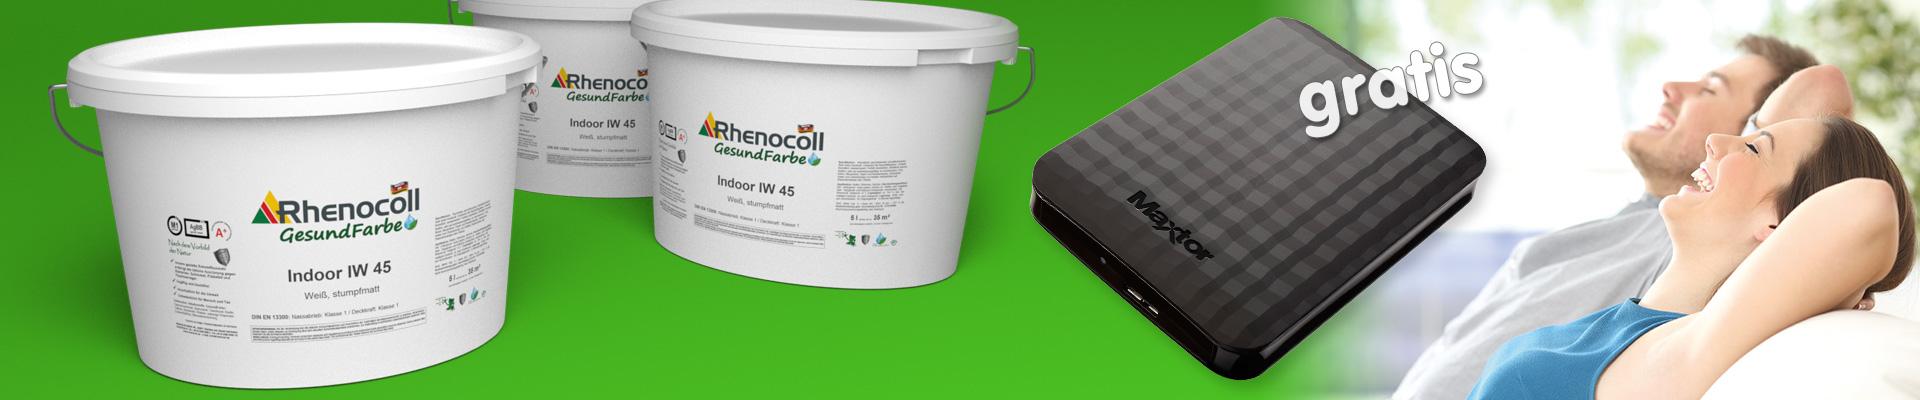 Rhenocoll IW 45 mit Festplatte